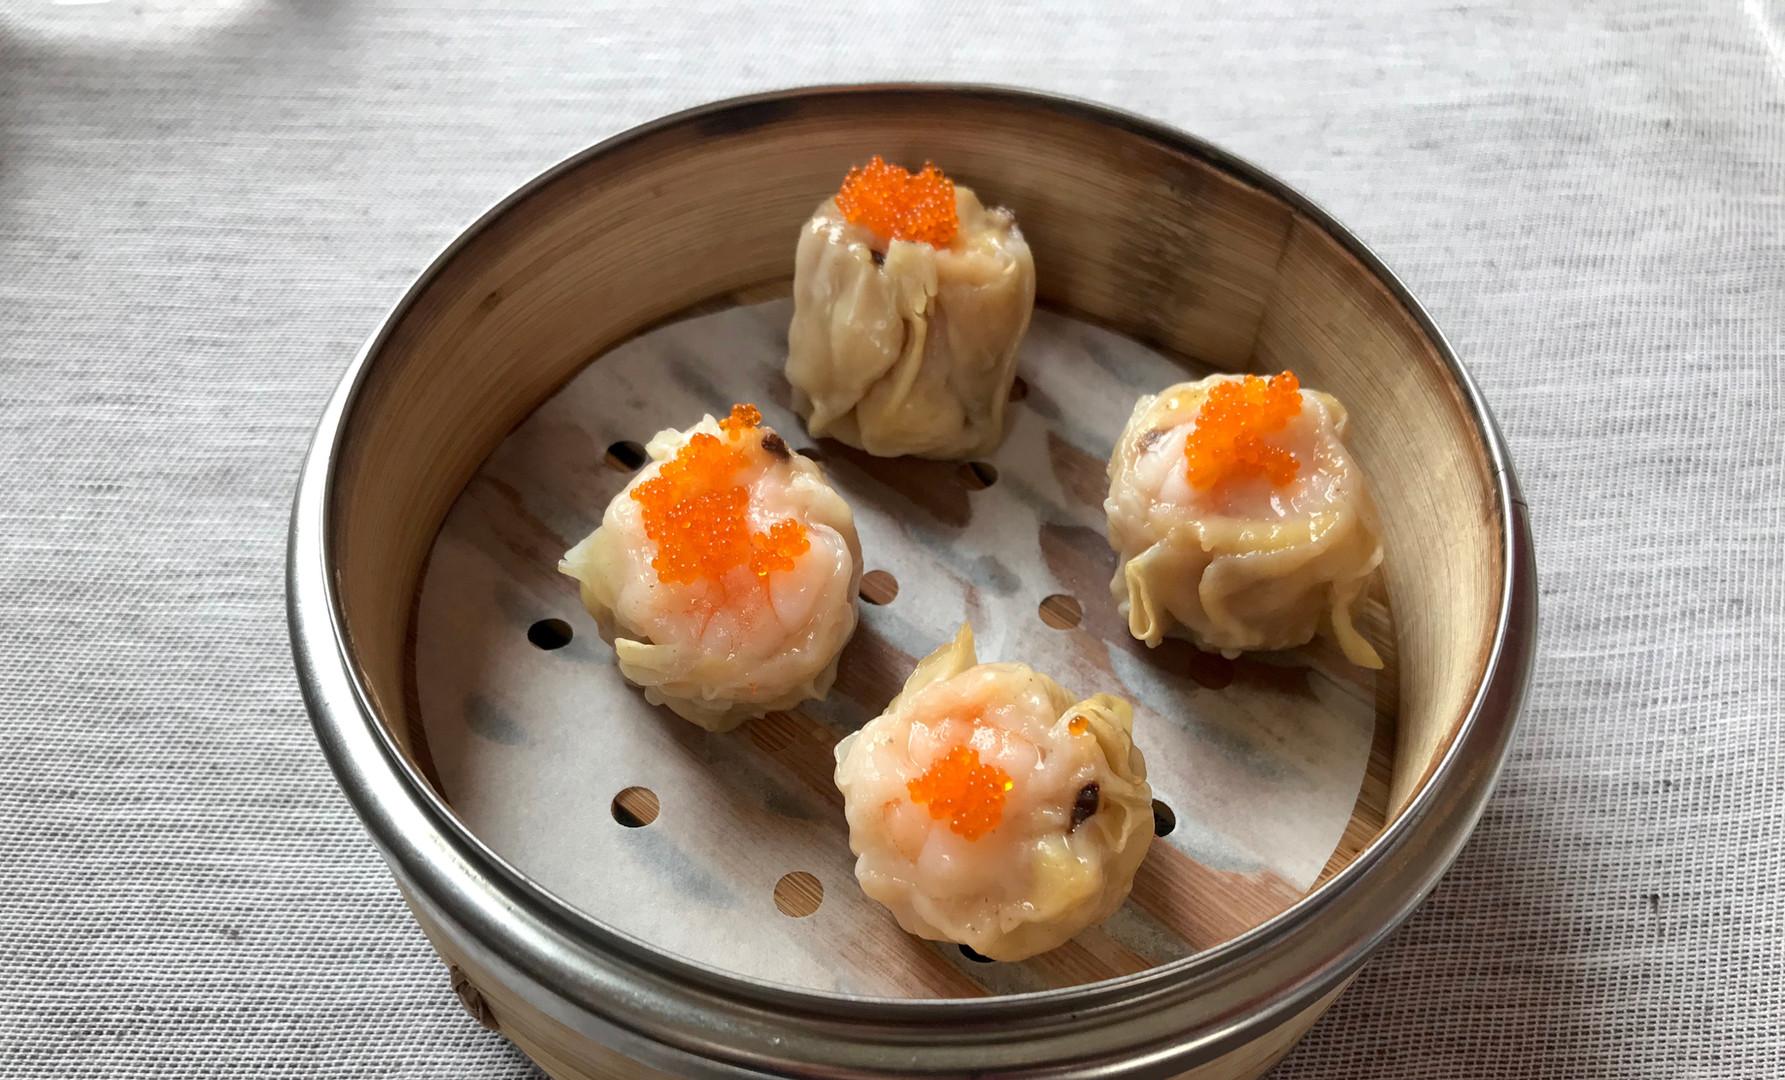 Shao Mai con Gamberi, Pollo e Funghi Shitake